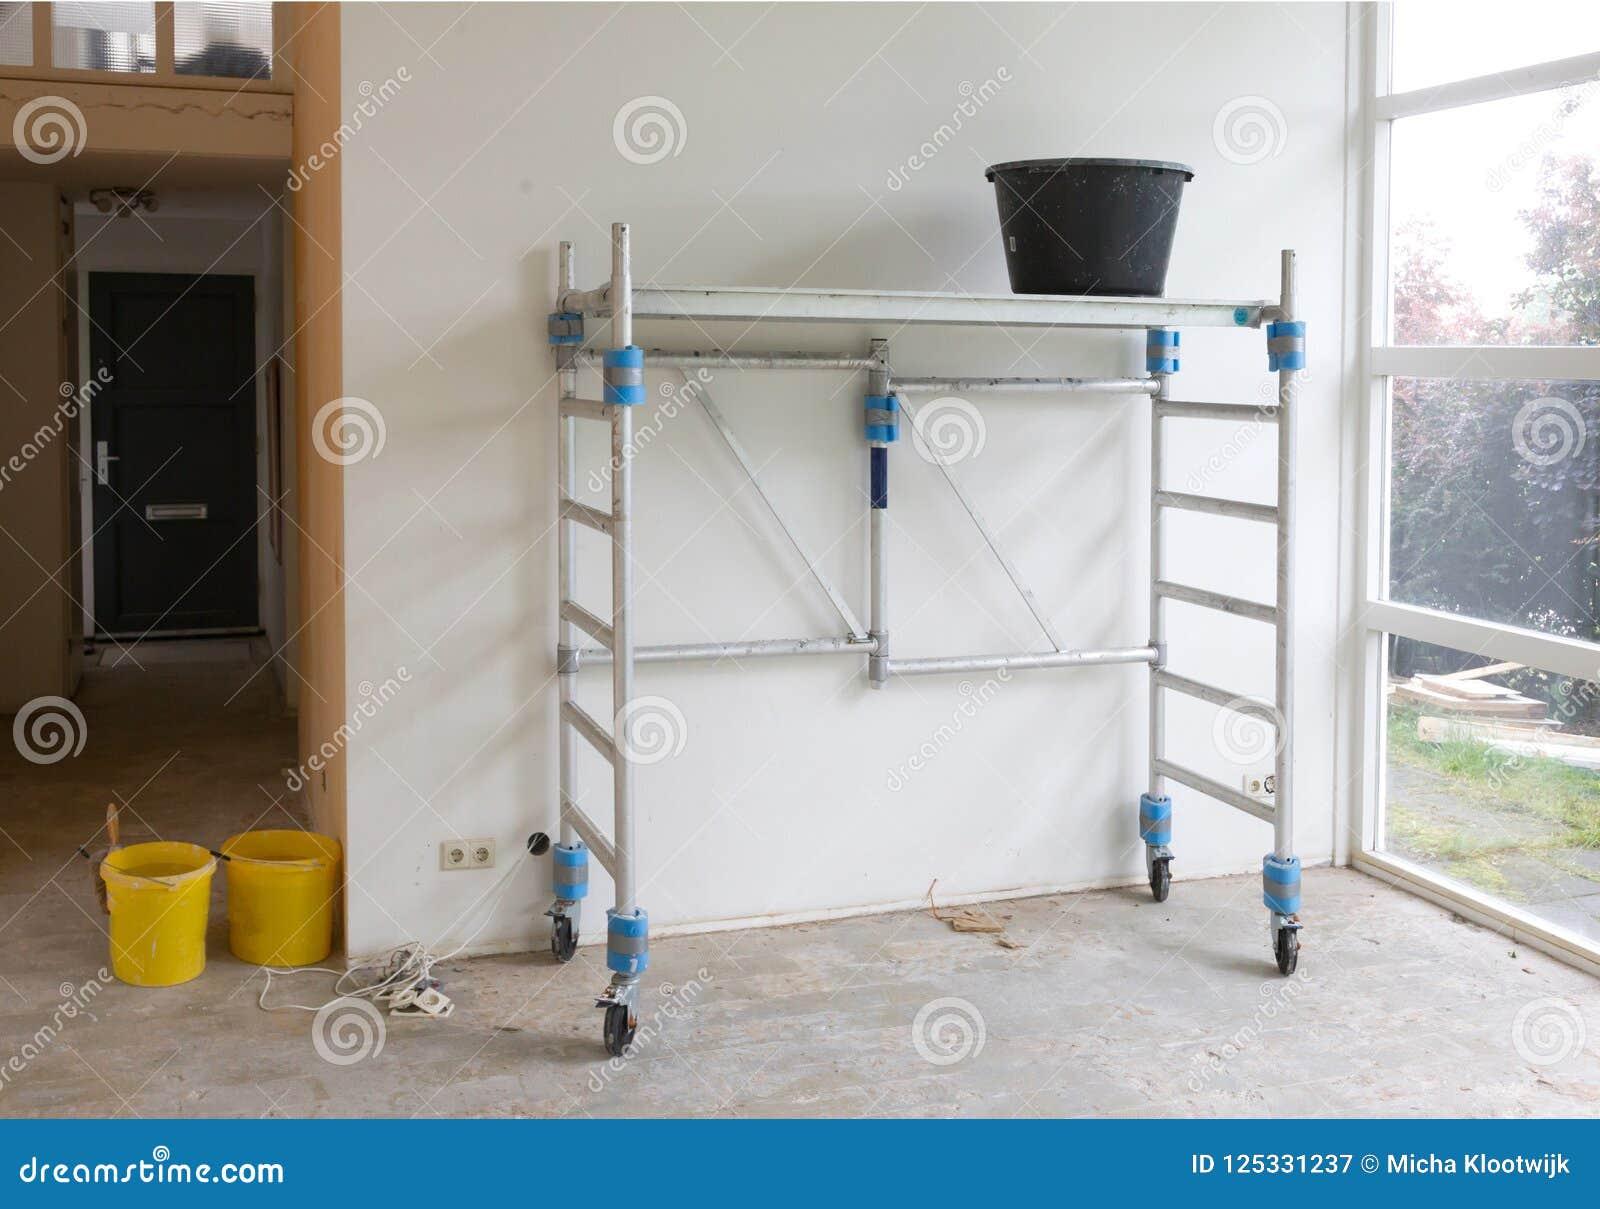 Arbeidershulpmiddelen - Emmer die zich op rollende steiger bevinden